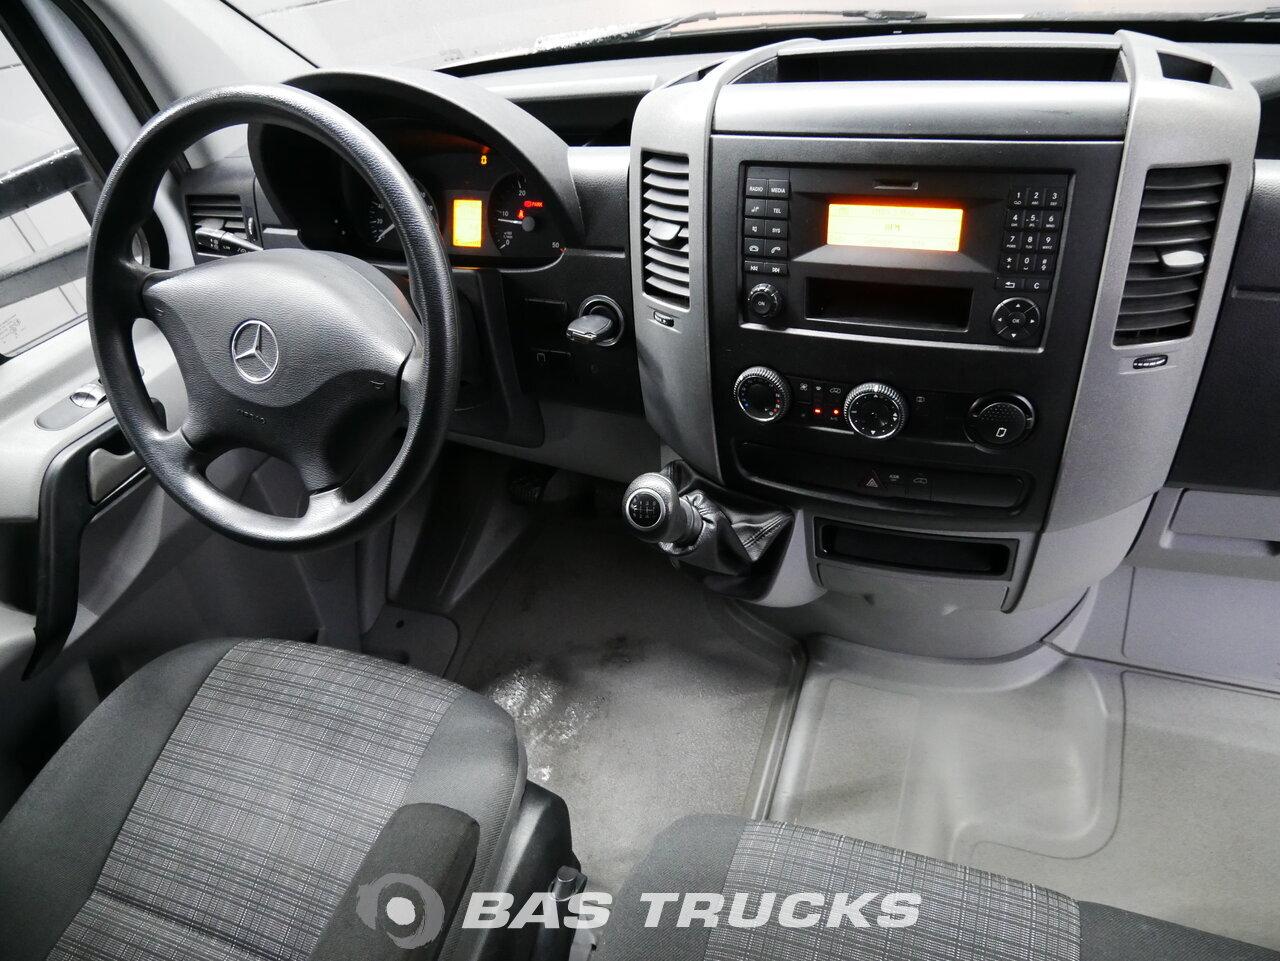 For sale at BAS Trucks: Mercedes Sprinter 09/2015